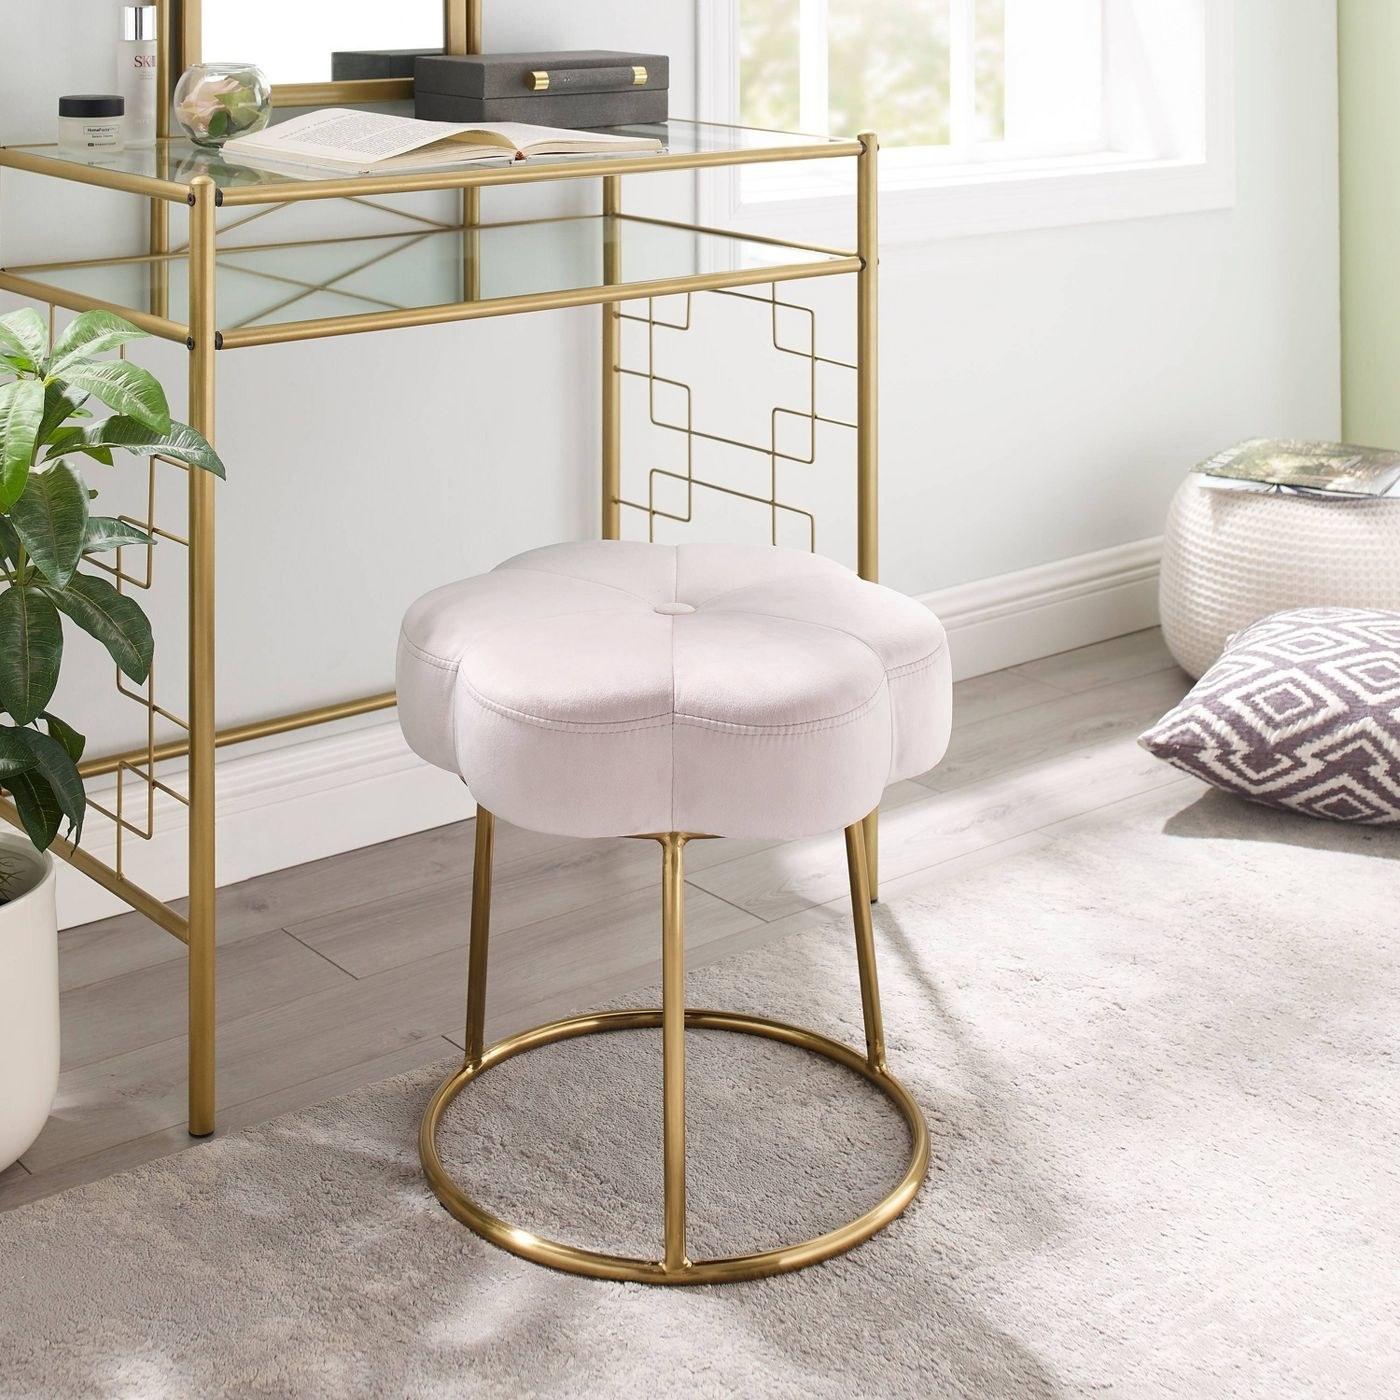 The pinkvanity accent stool